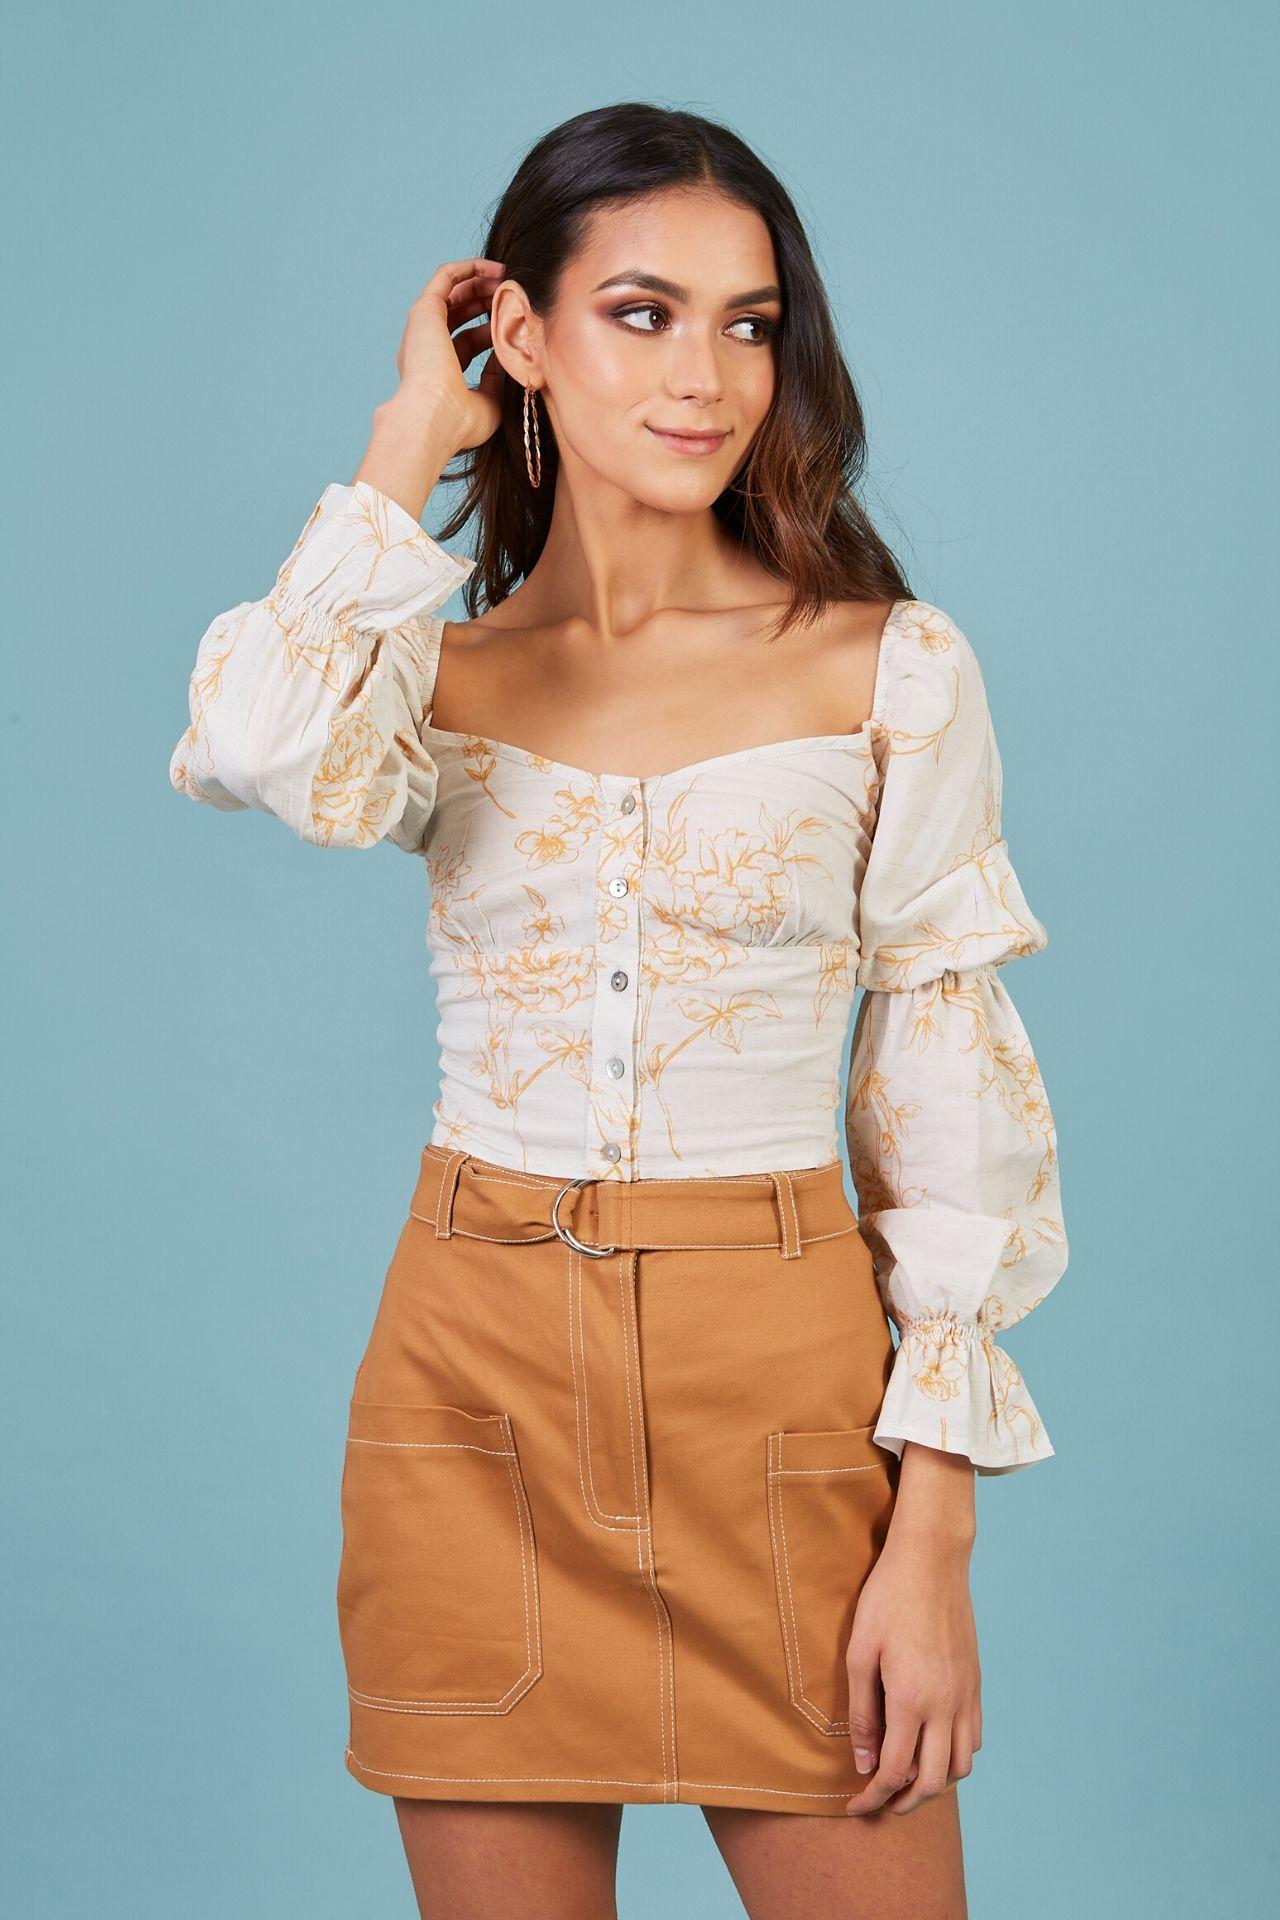 Blusa manga larga cuello cuadrado, mangas abullonadas.  Material: Lino, 100% algodón